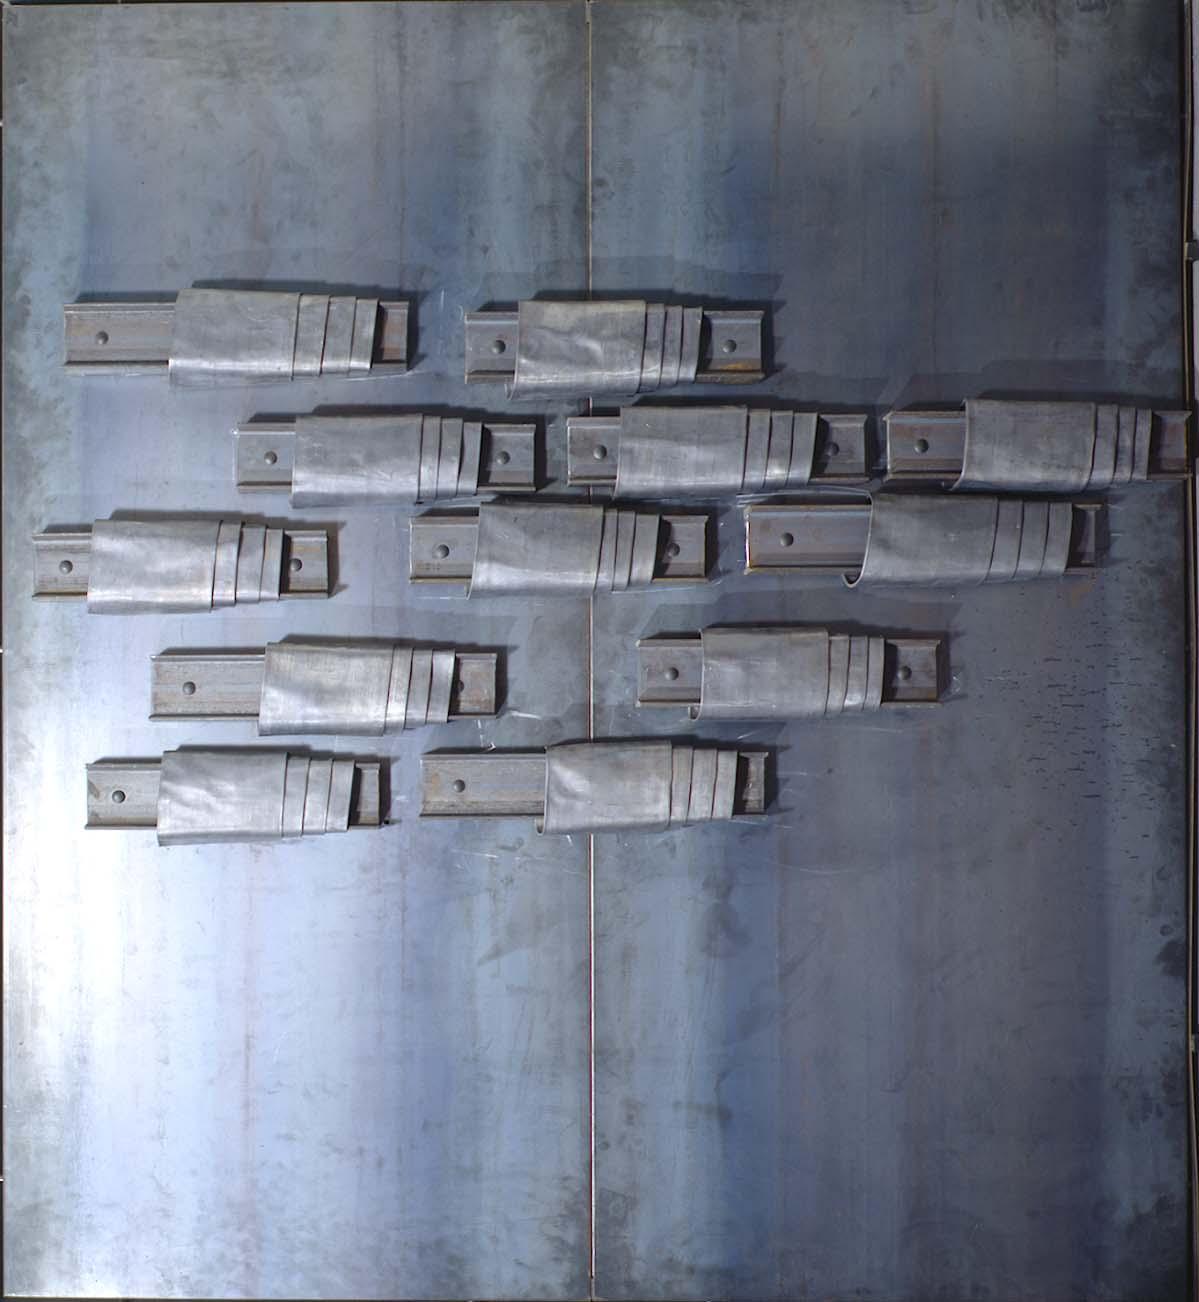 Jannis Kounellis, Senza titolo, 1989, ferro e piombo, 183x206x12 cm